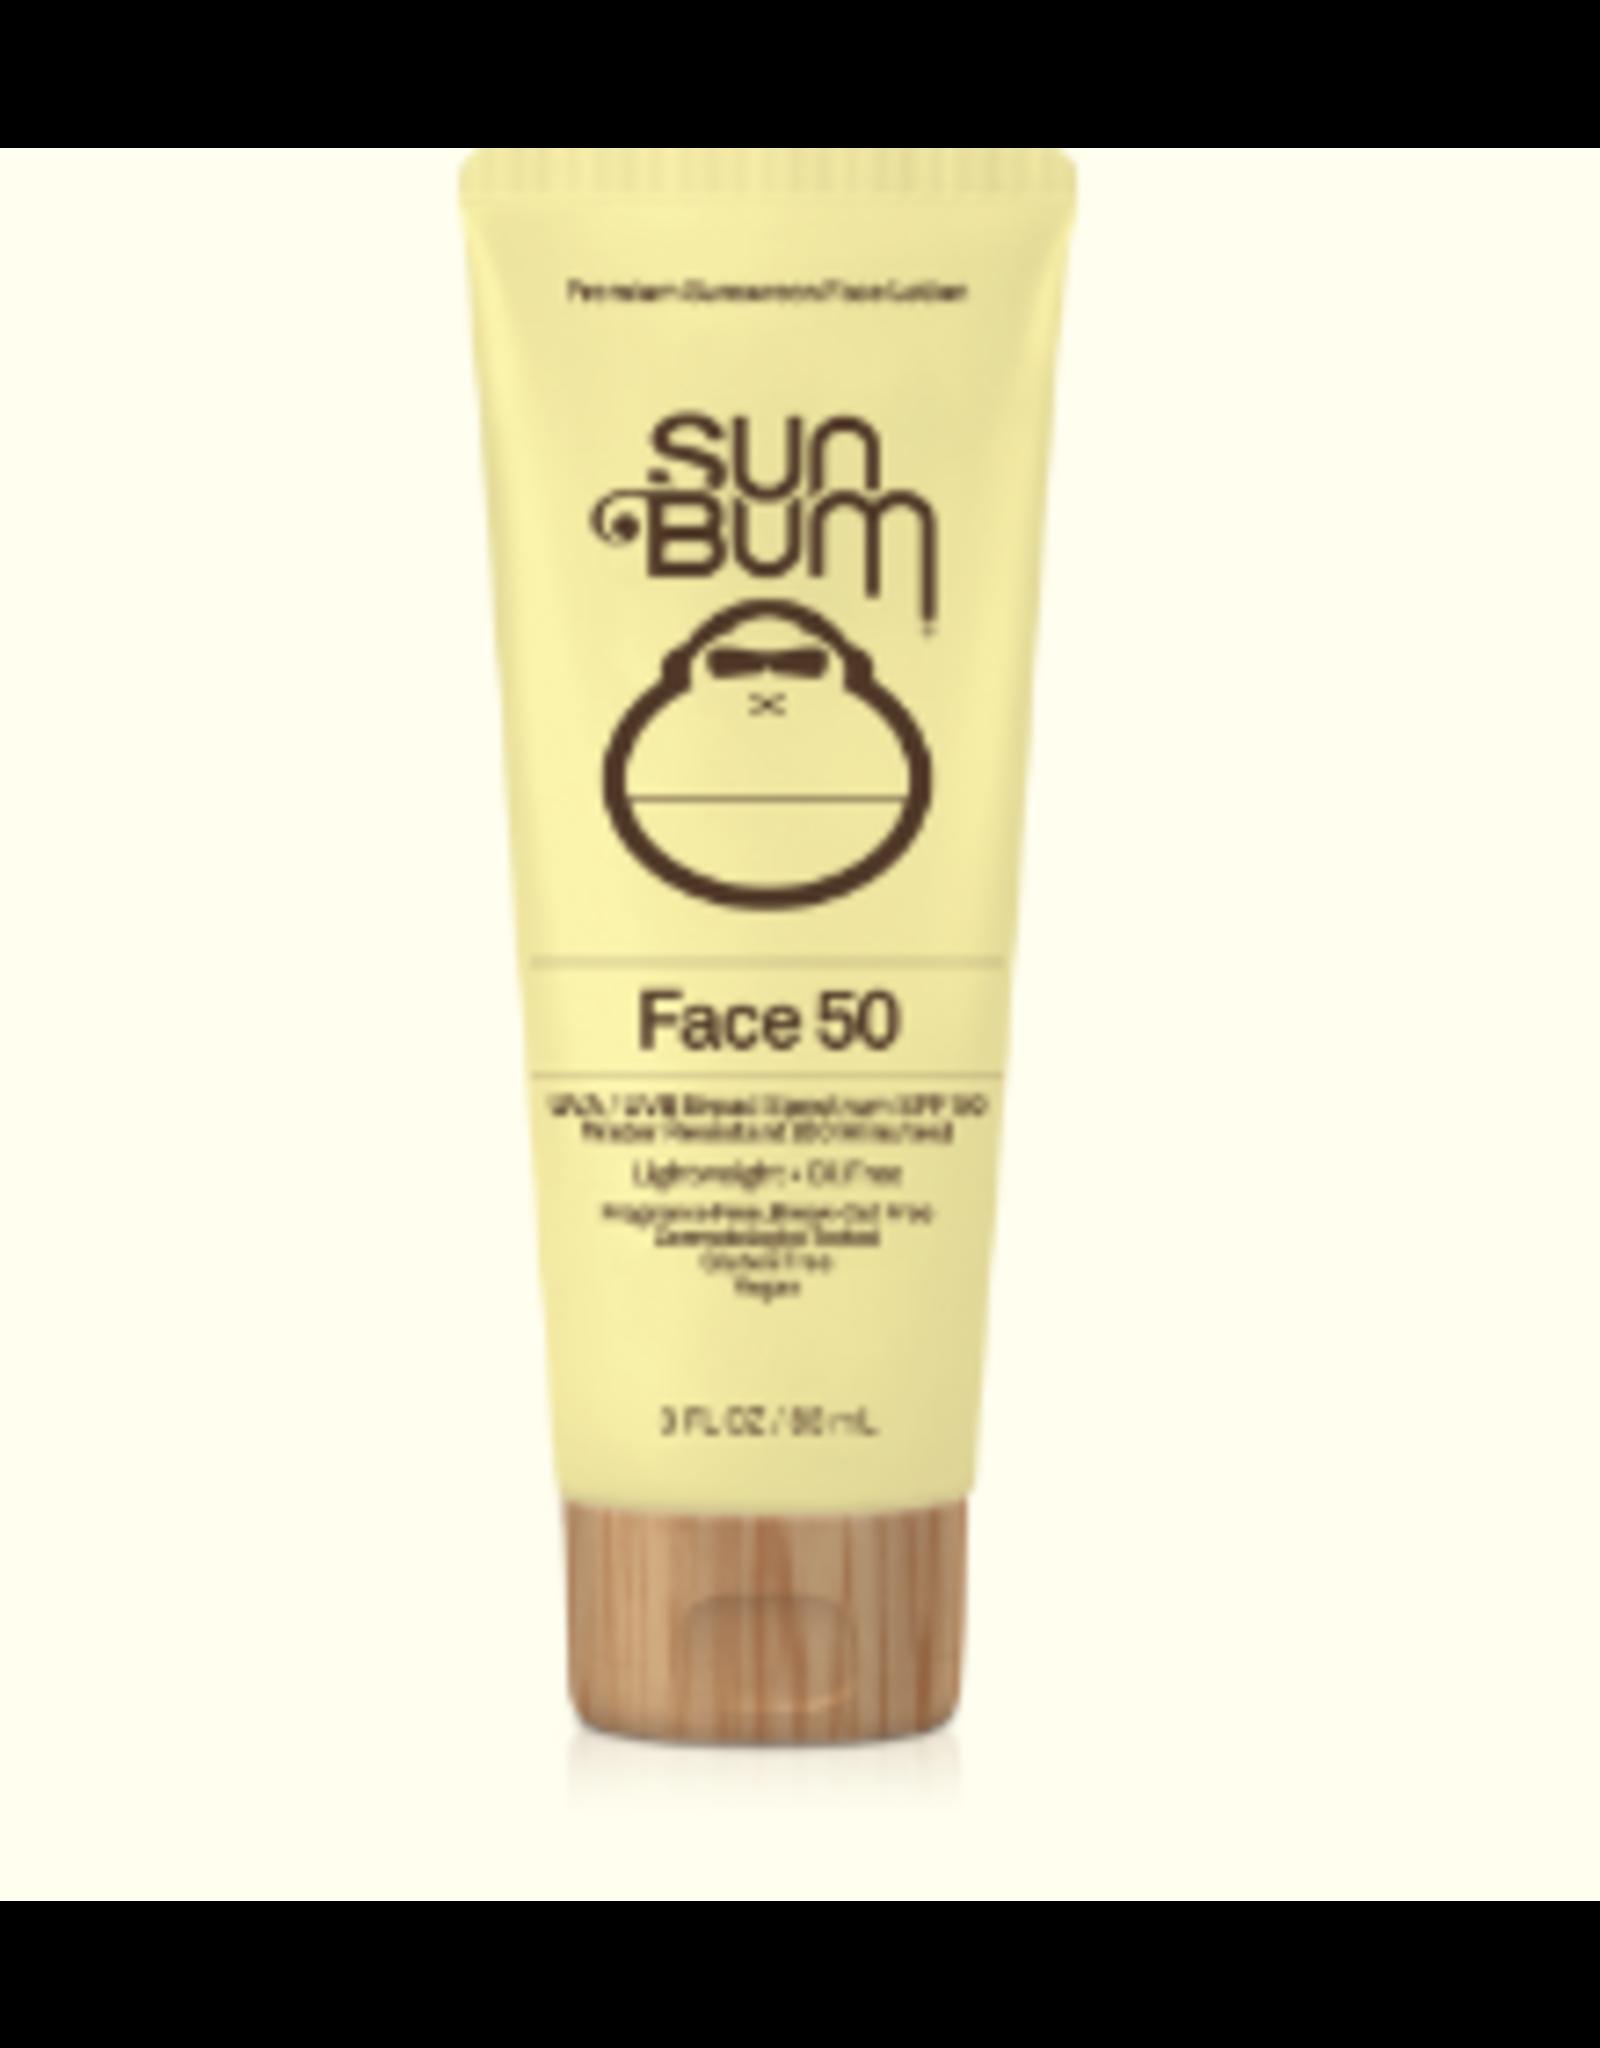 SUN BUM Original Sunscreen Face Lotion - SPF 50 - 3oz